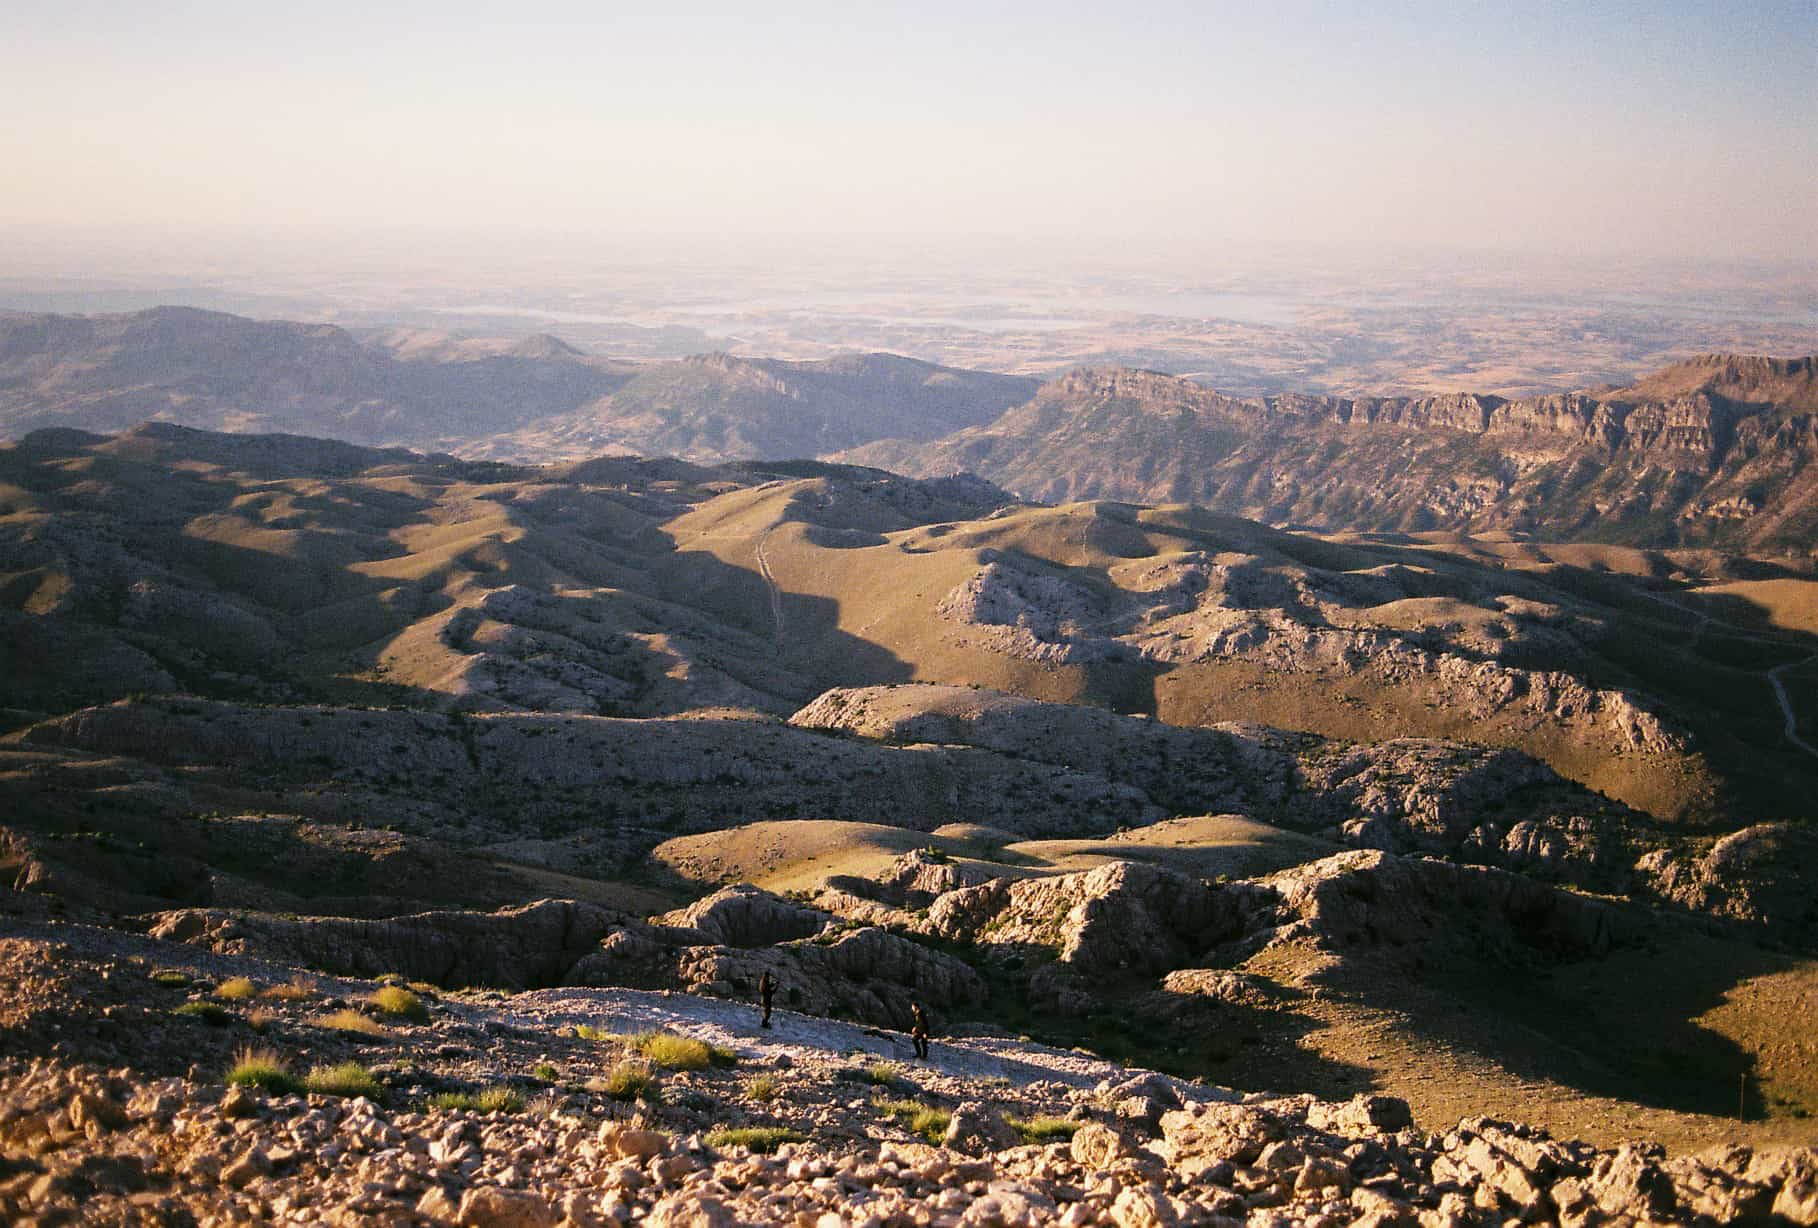 Nemrut Landscape